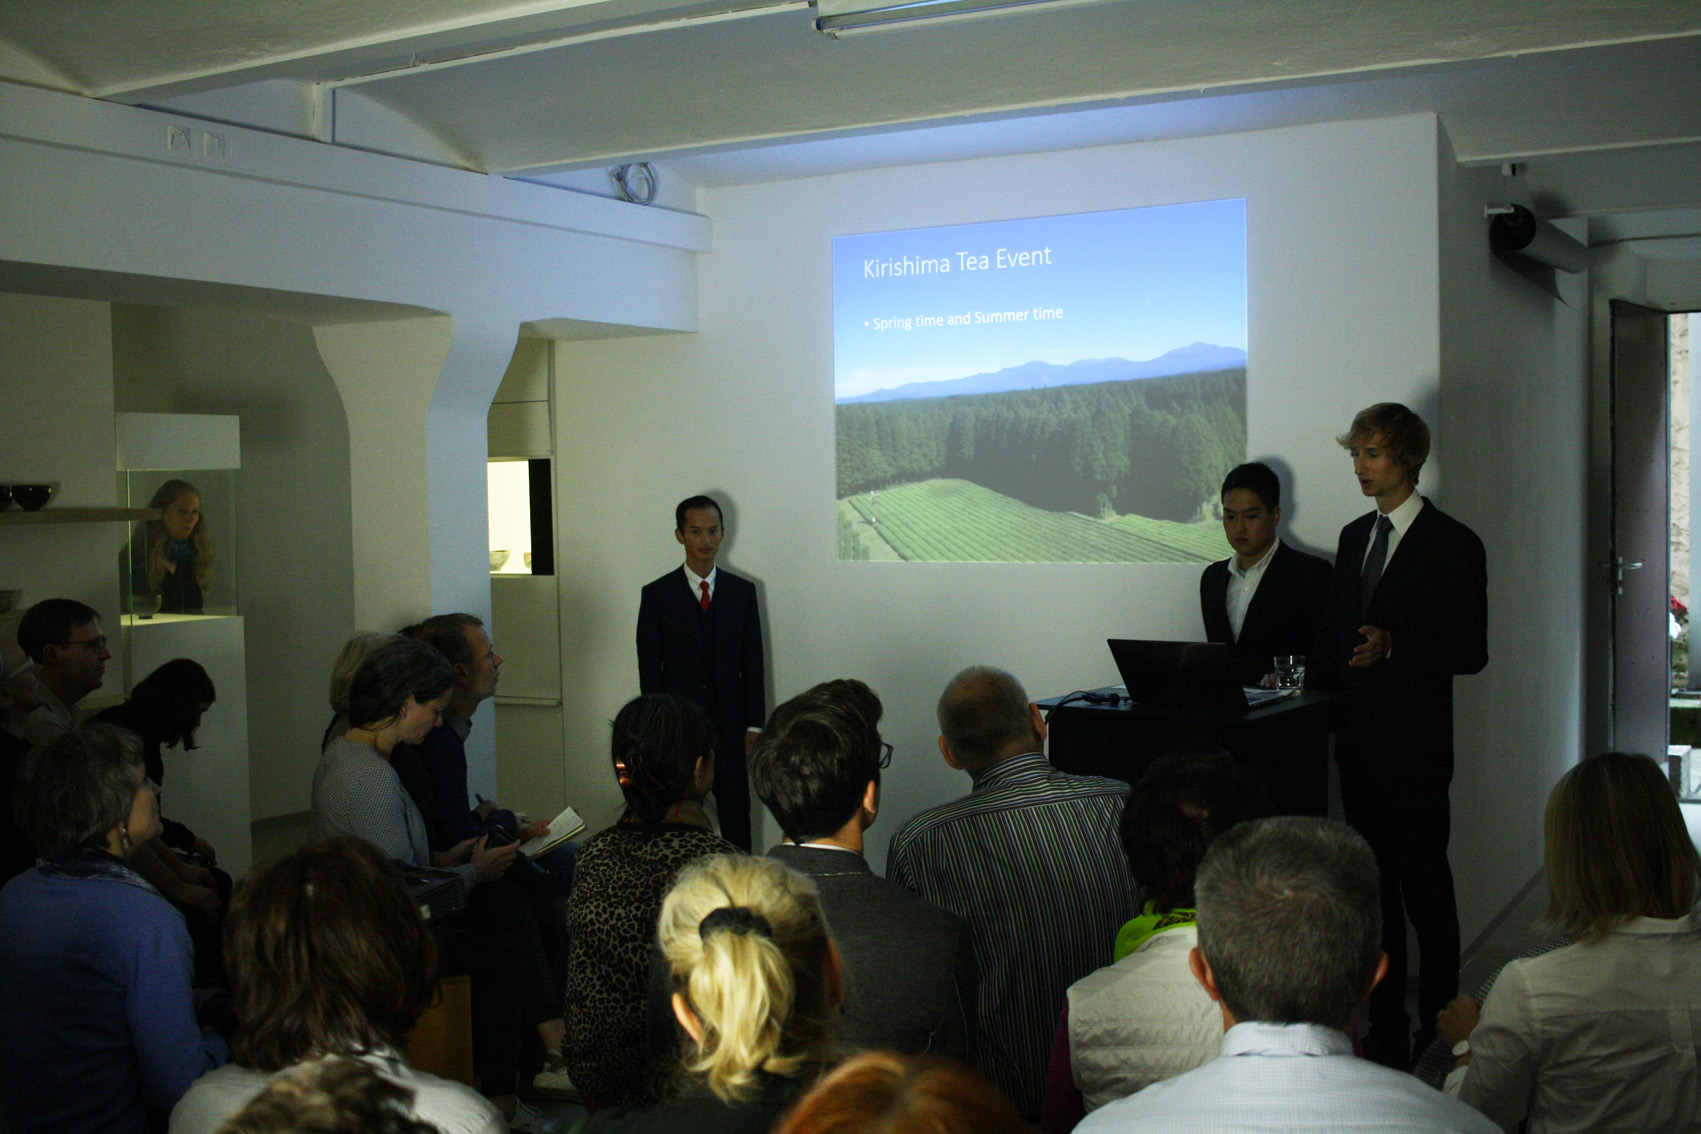 Shutaro and Kenji Hayashi during the presentation of their tea garden